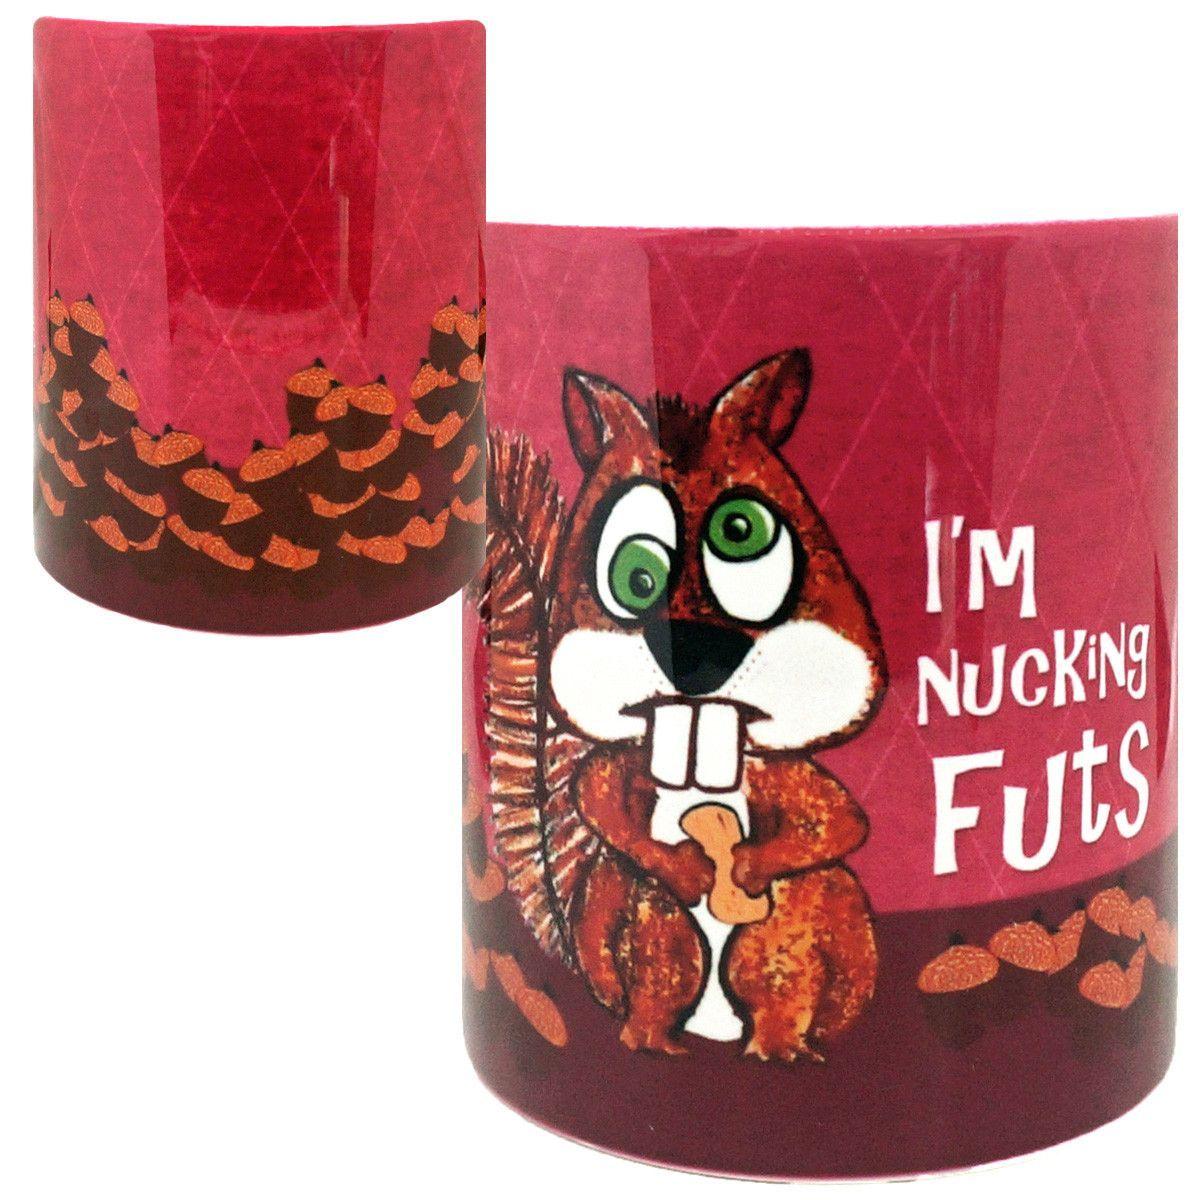 Nucking Futs Funny Squirrel Mug White coffee cups, Mugs